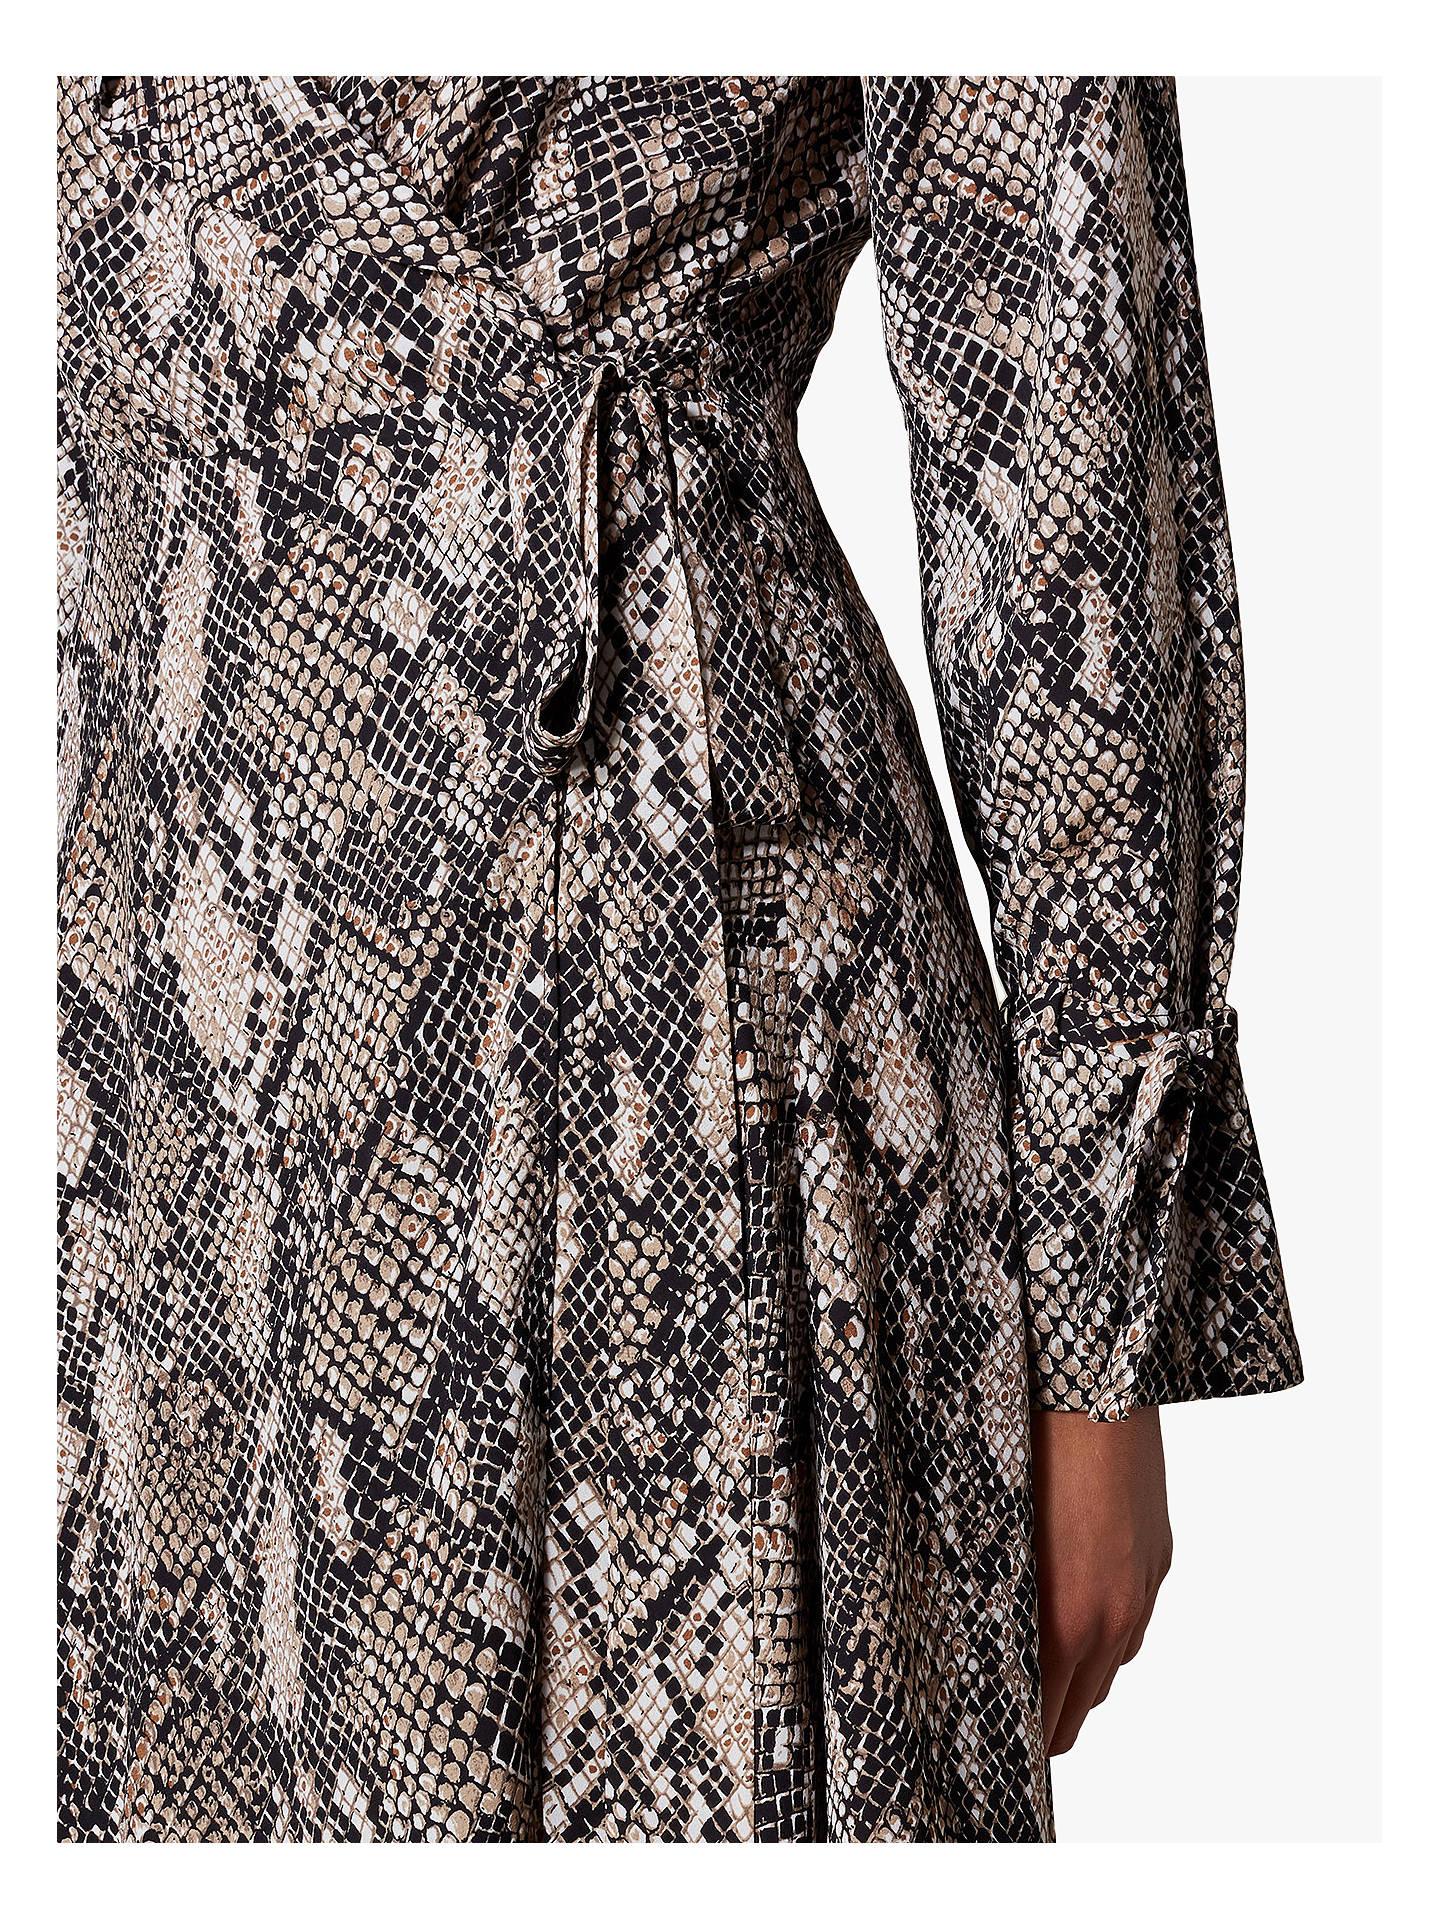 404bd1ecc2e8 ... Buy Karen Millen Snakeskin Print Maxi Dress, Multi, 6 Online at  johnlewis.com